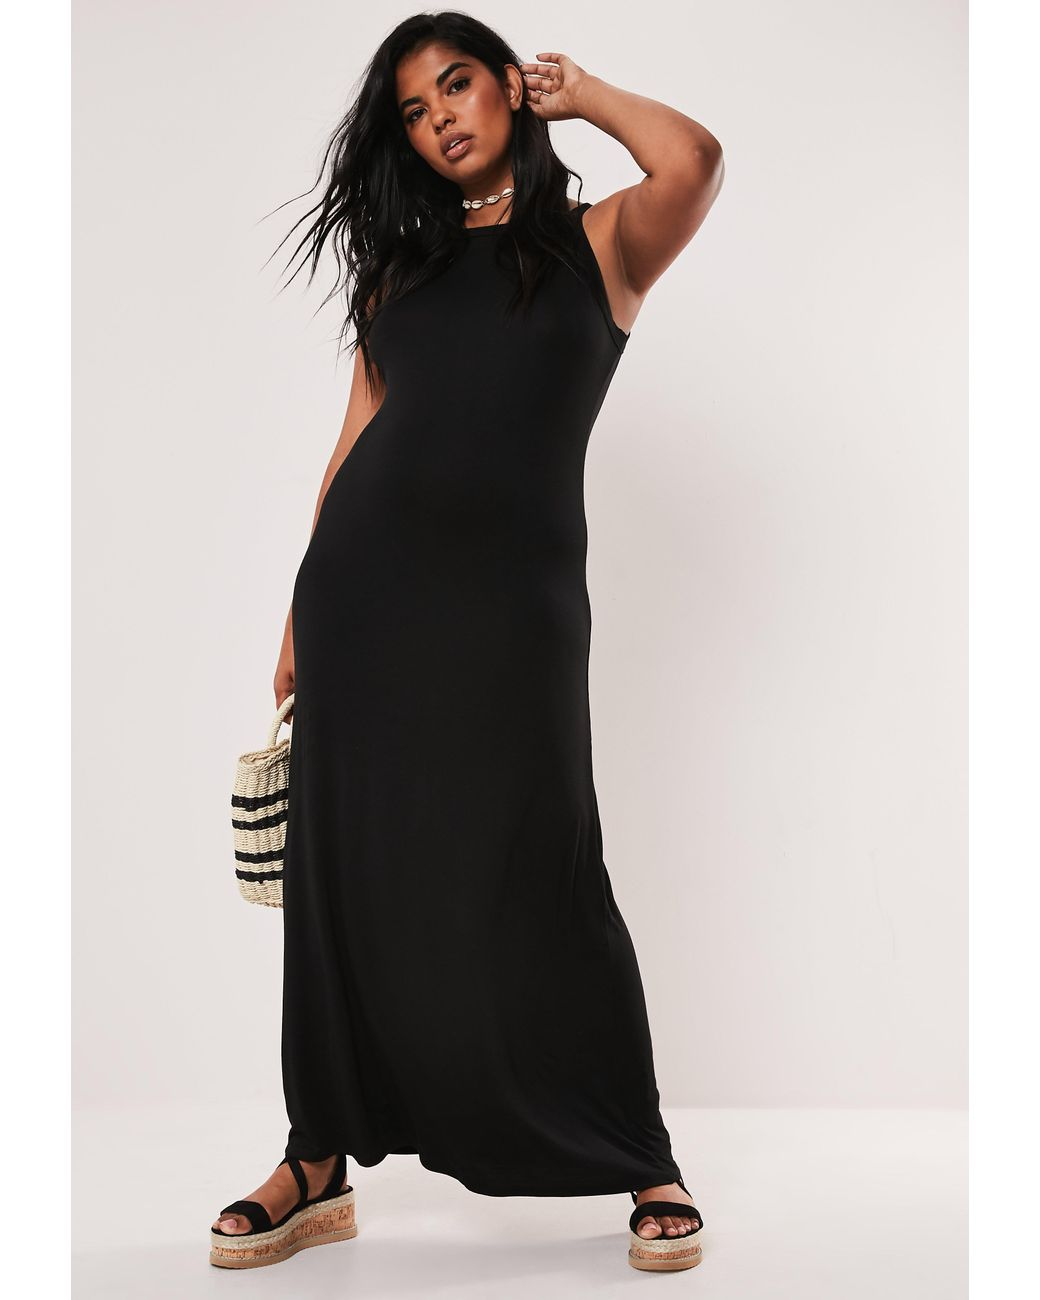 Plus Size Black Strappy Jersey Maxi Dress